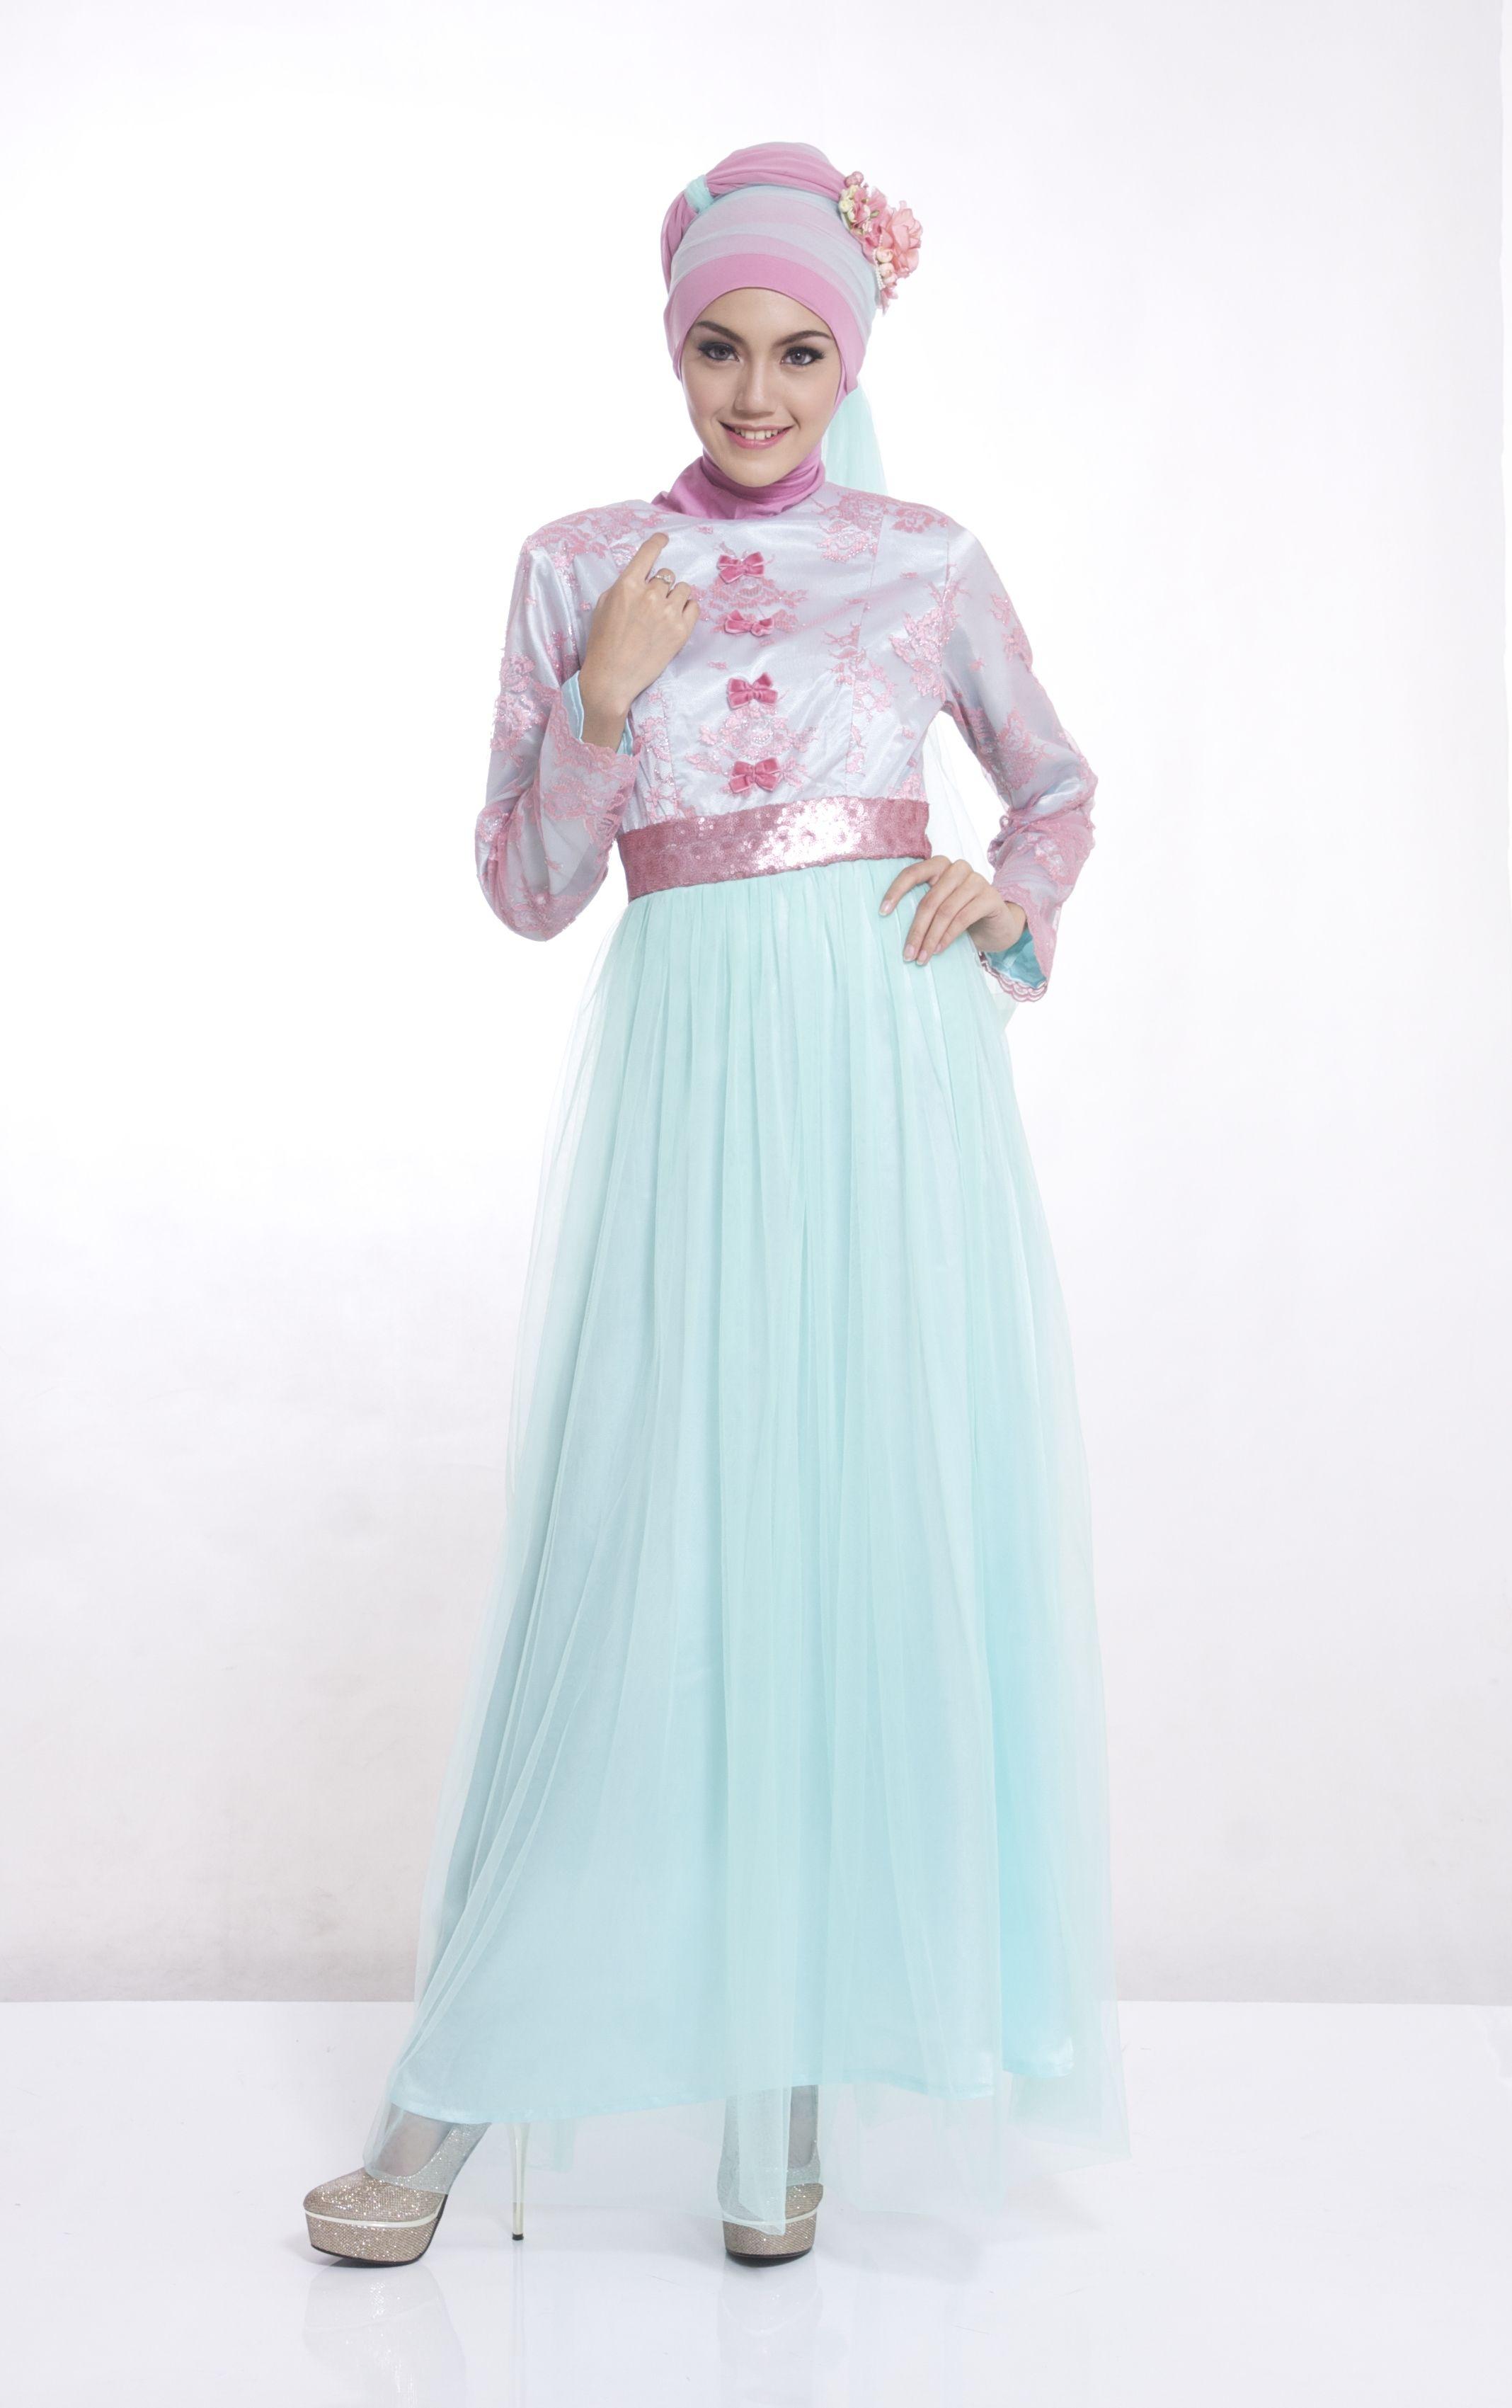 Penampilan muslimah kamu akan semakin cantik dengan menggunakan Gamis Bergo Busana muslim yang satu ini model gaun pesta muslimah terbaru